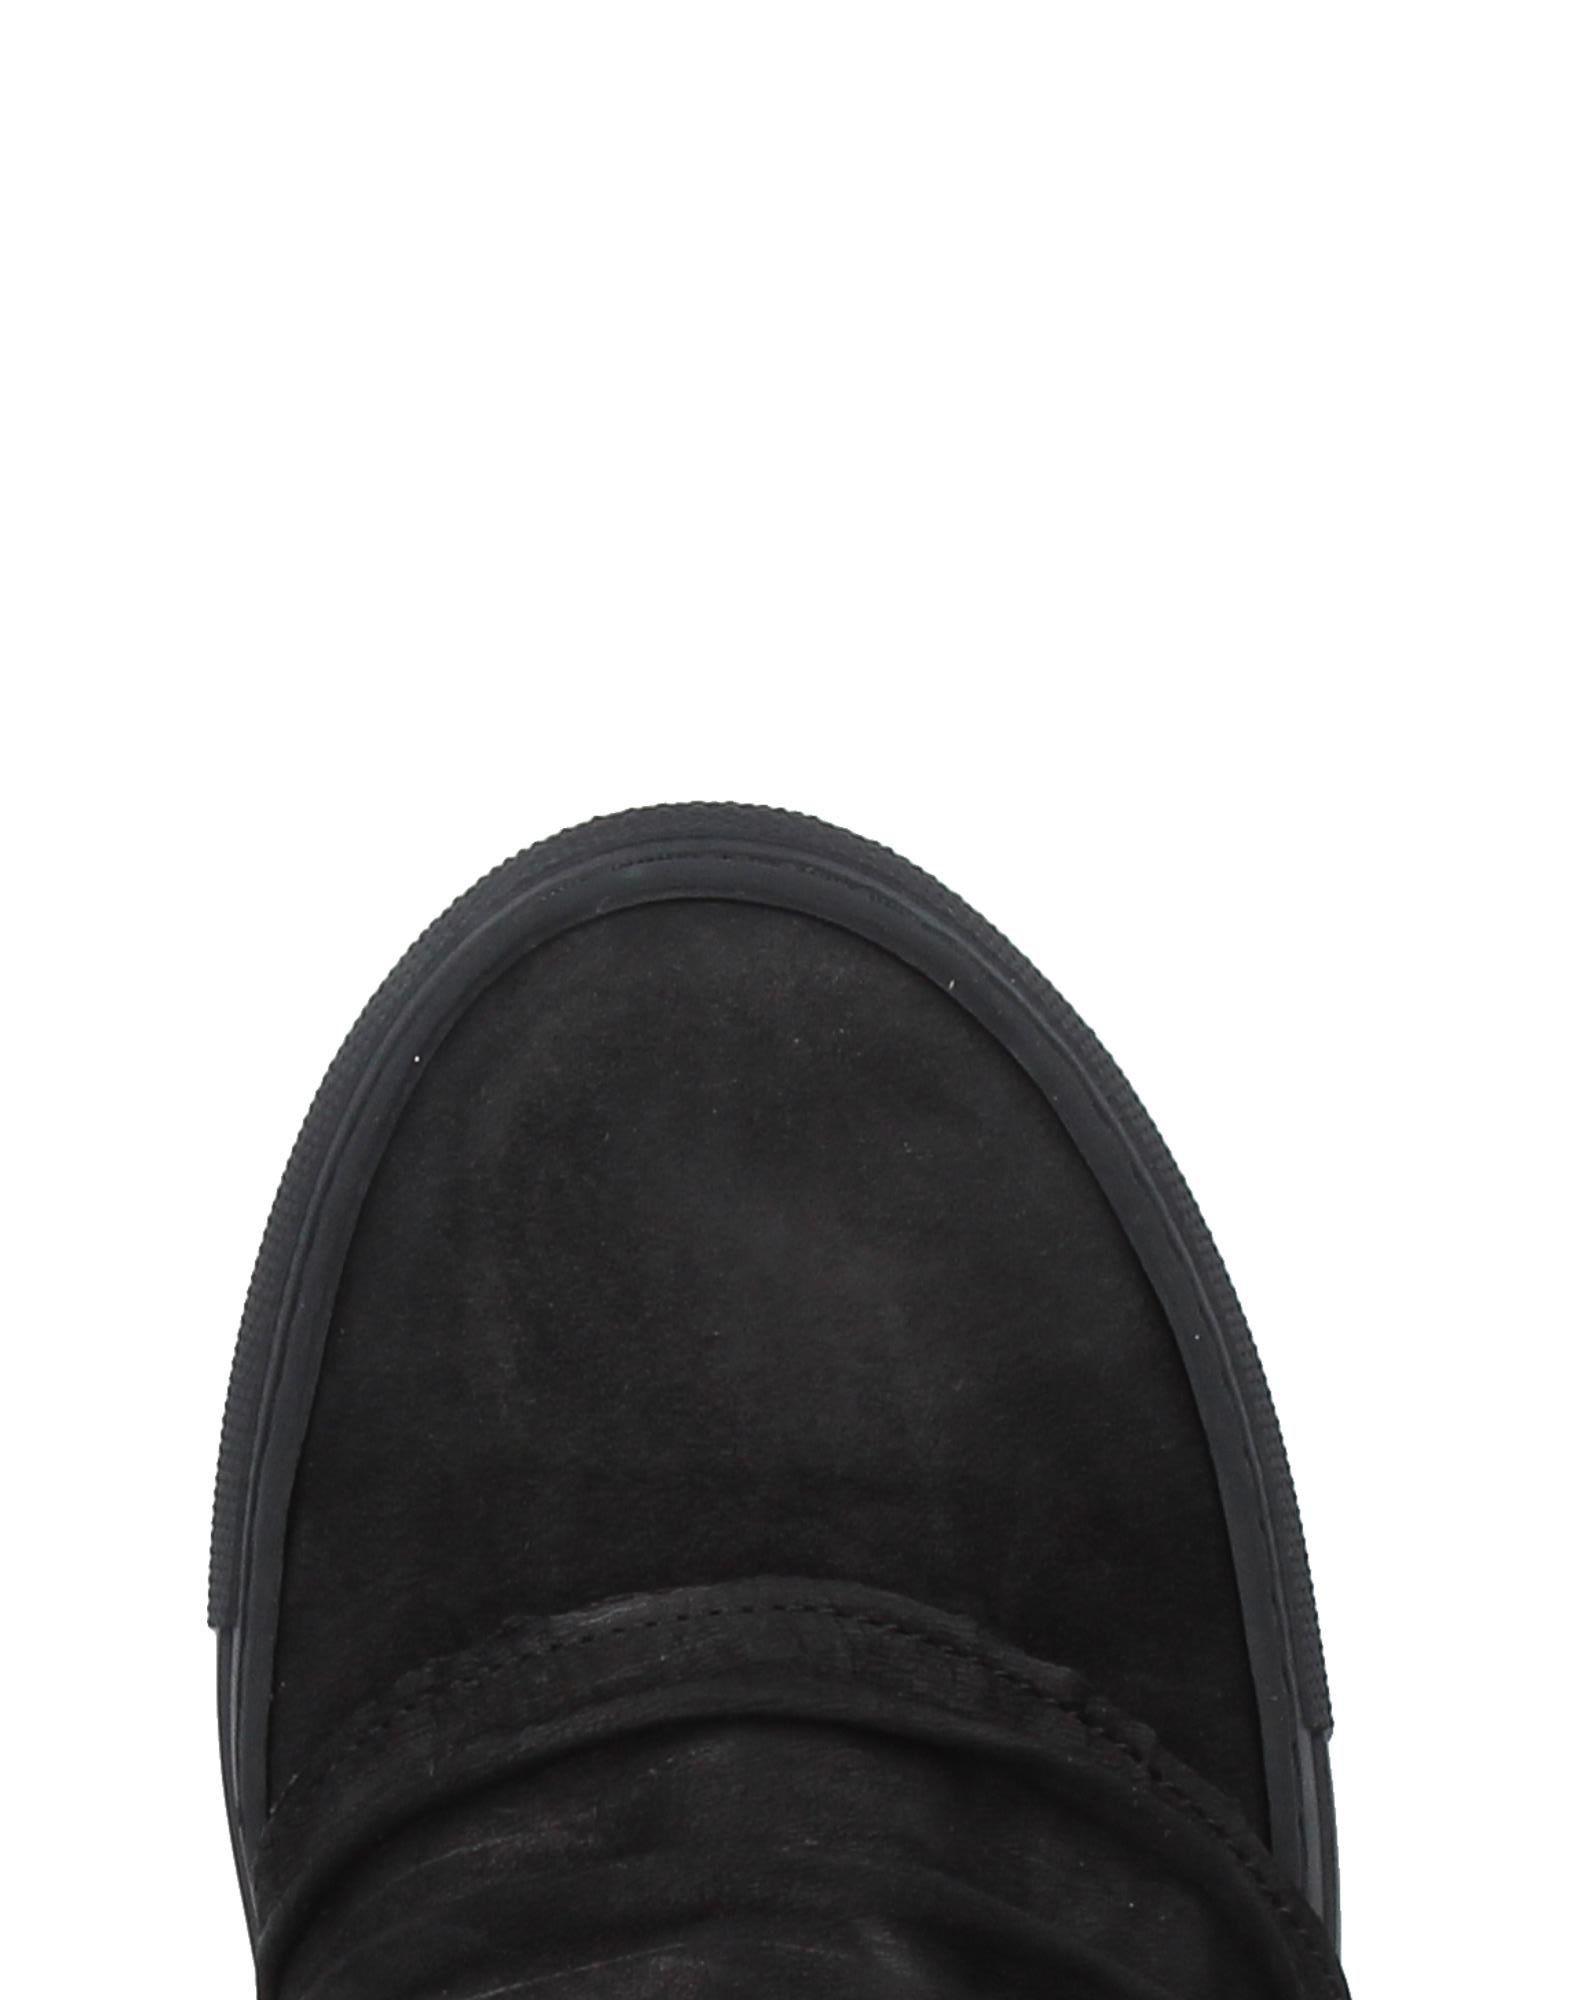 The Last Conspiracy Sneakers Damen Damen Sneakers Gutes Preis-Leistungs-Verhältnis, es lohnt sich 00673c